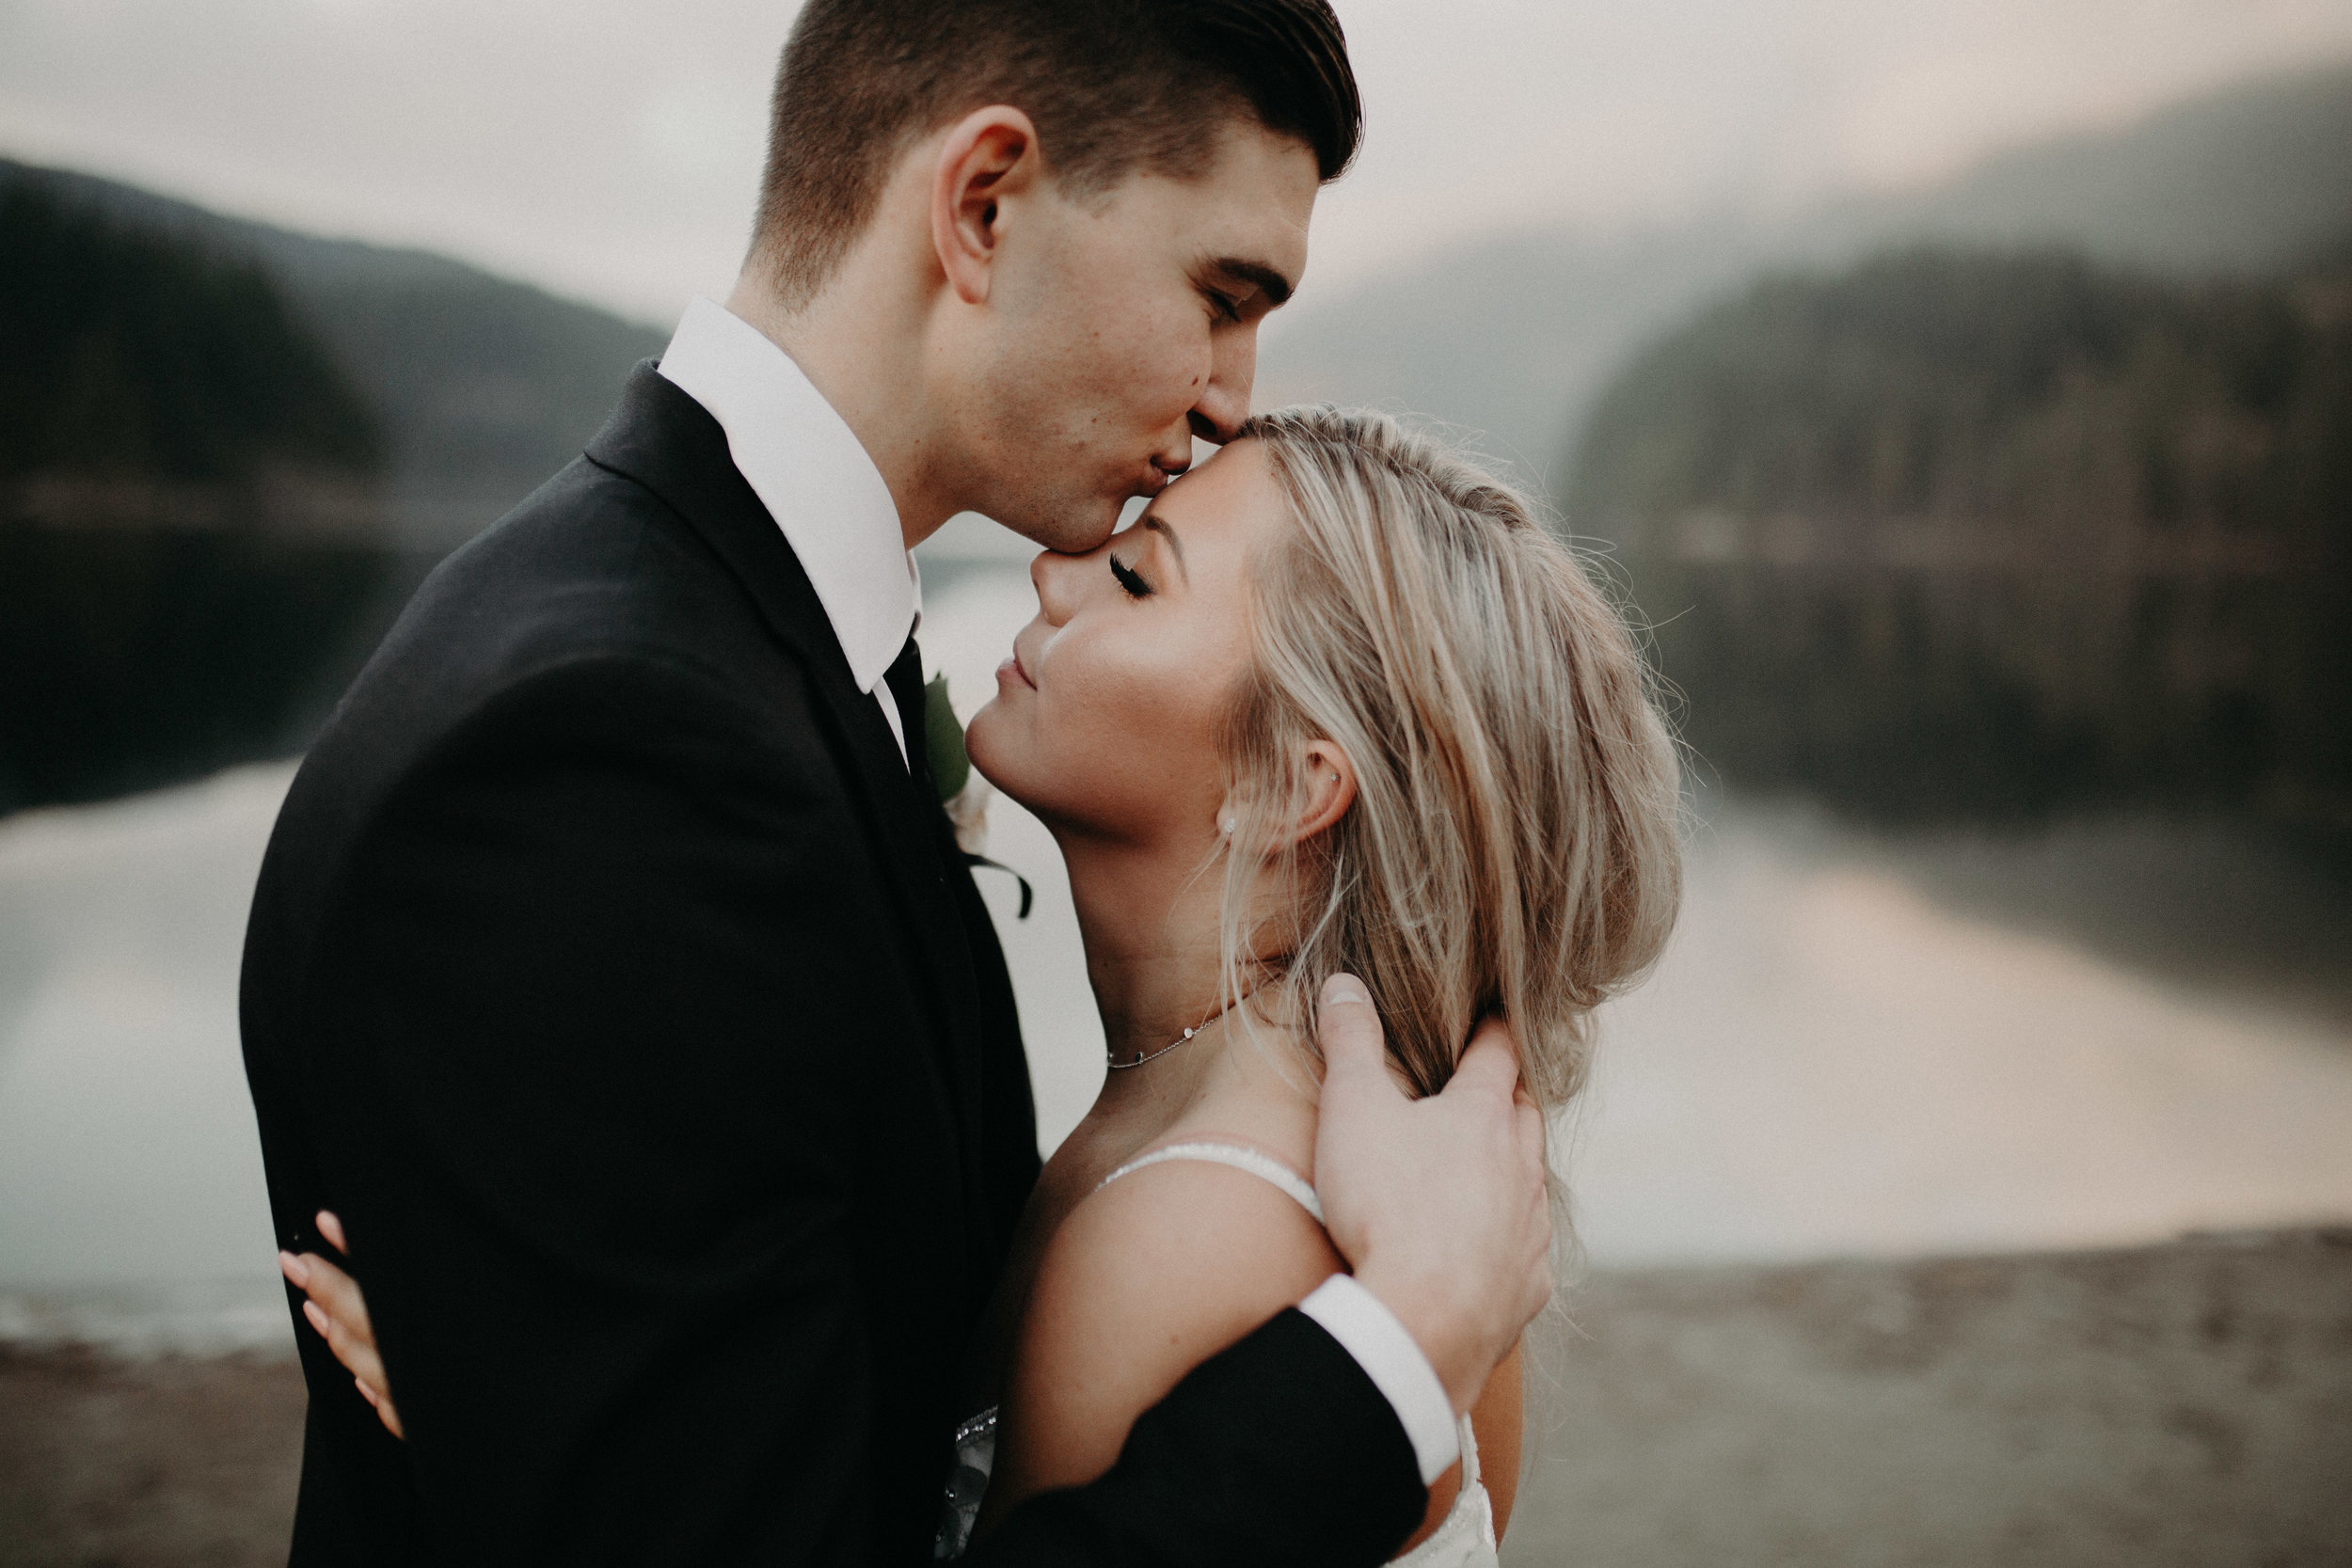 The McLachlans - BC Wedding Photographers - Westwood Plateau - Tynan and Maty-573.jpg